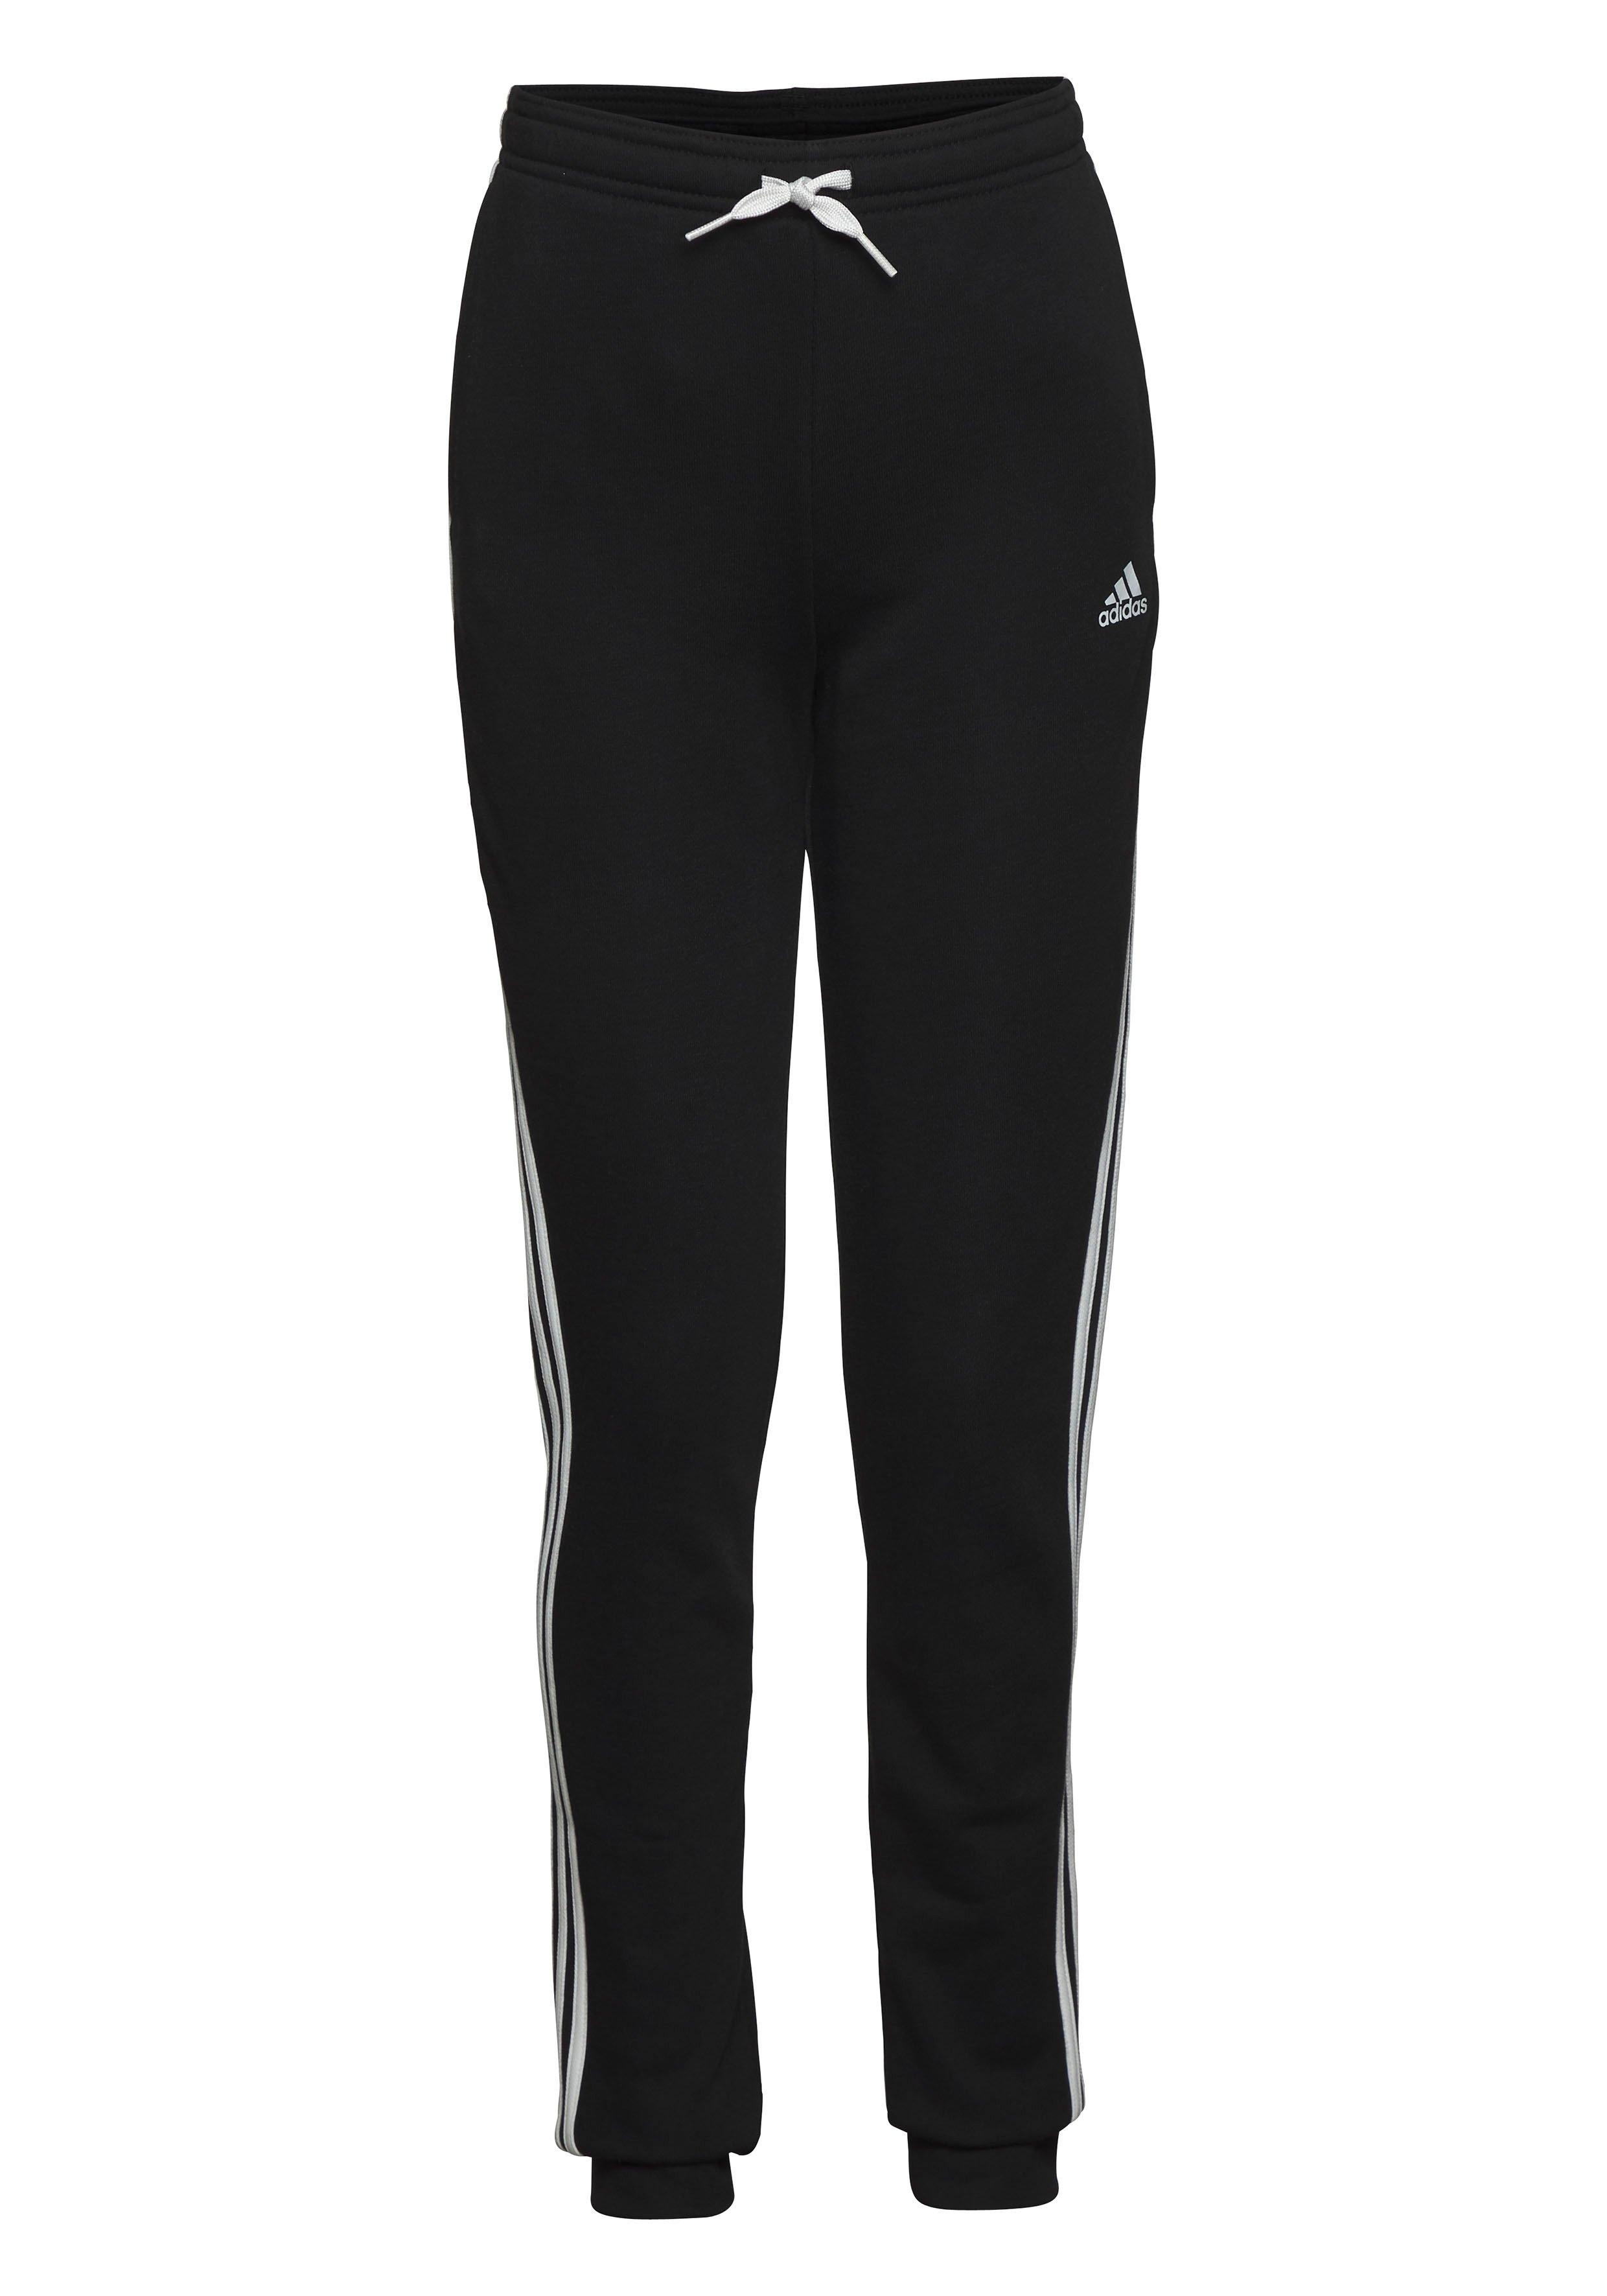 adidas Performance joggingbroek »ADIDAS ESSENTIALS 3-STREIFEN FRENCH TERRY« nu online kopen bij OTTO